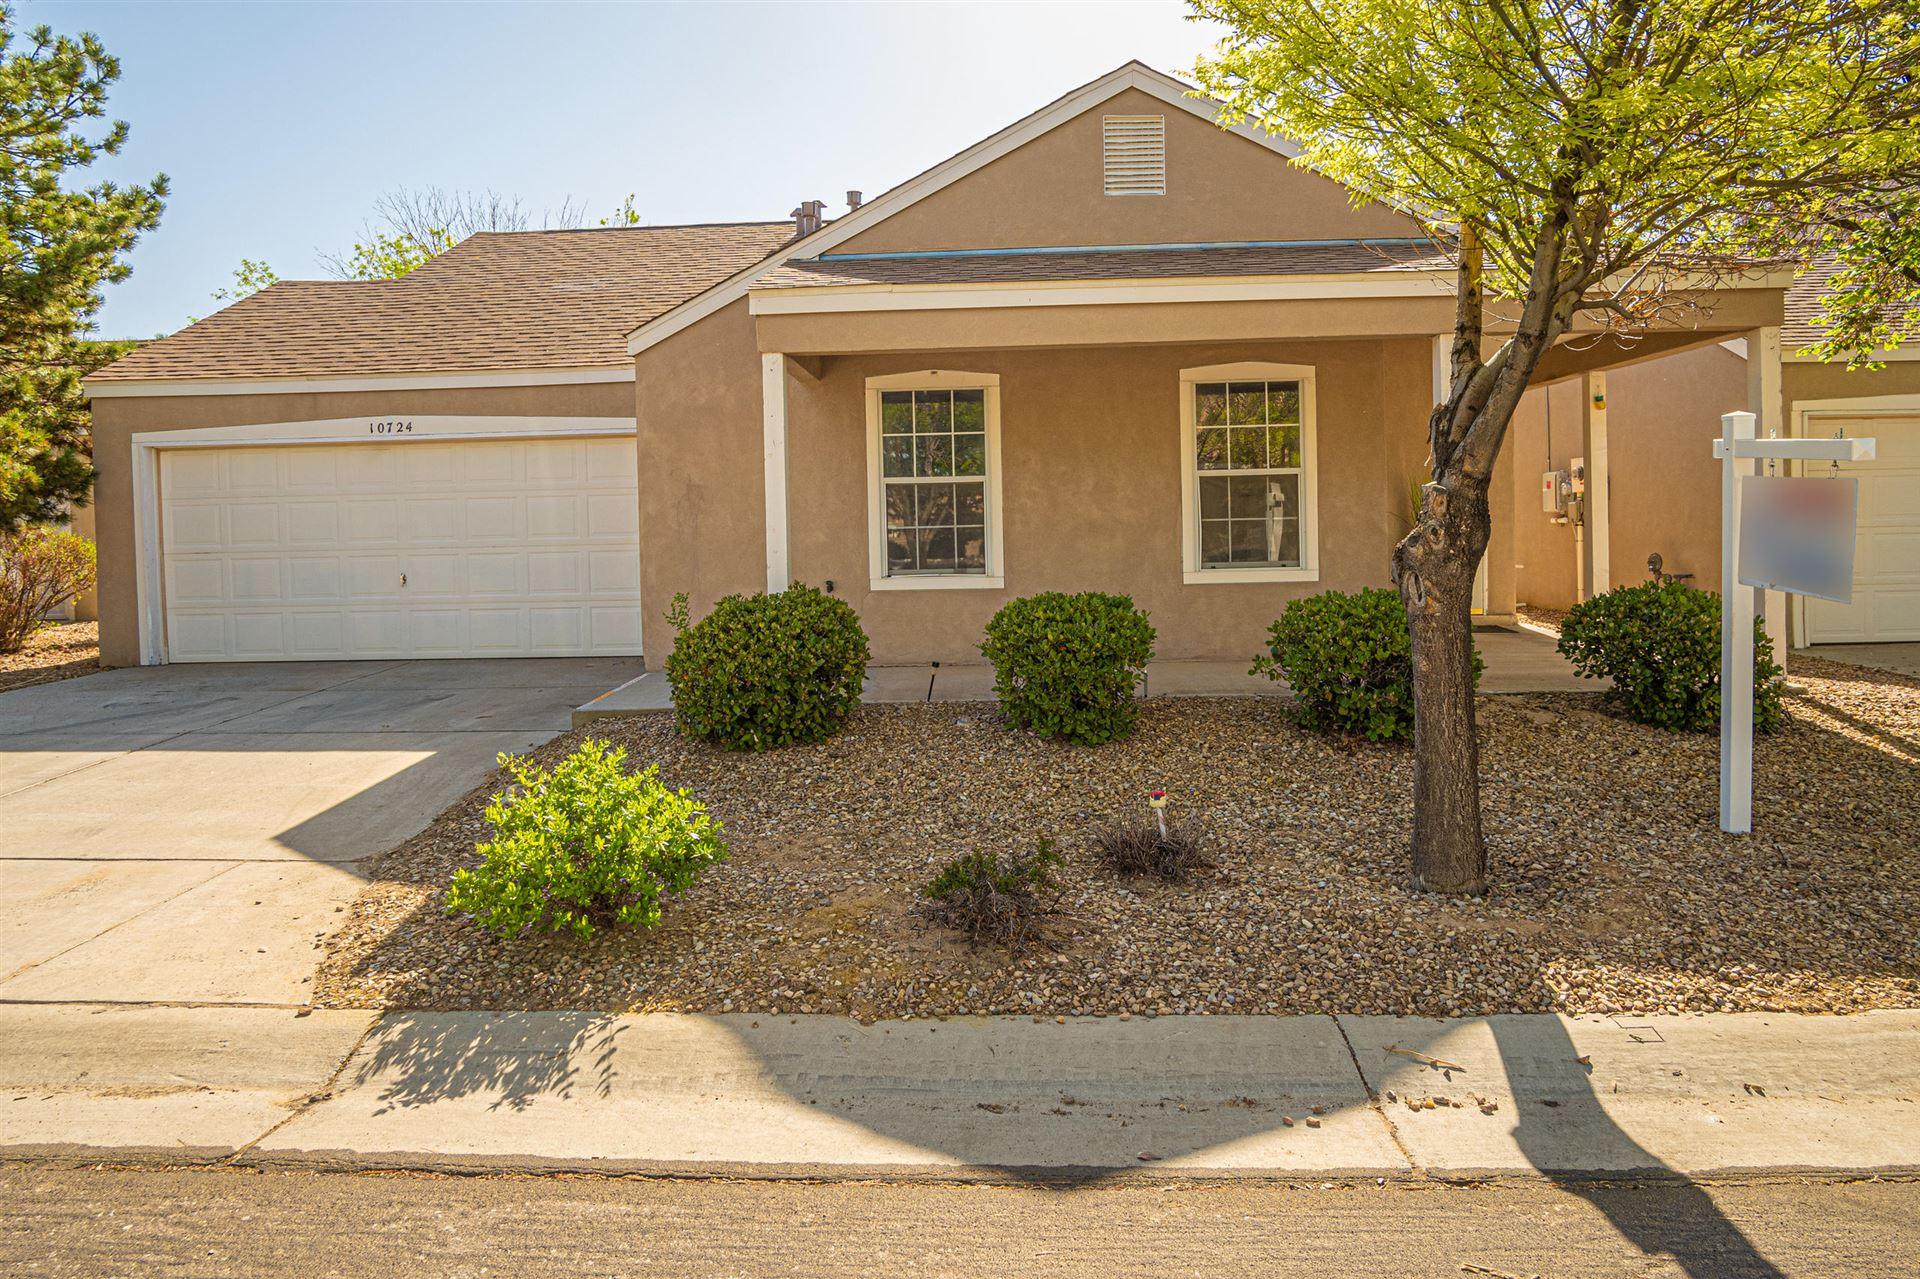 Photo of 10724 CHILILI Drive NW, Albuquerque, NM 87114 (MLS # 991522)